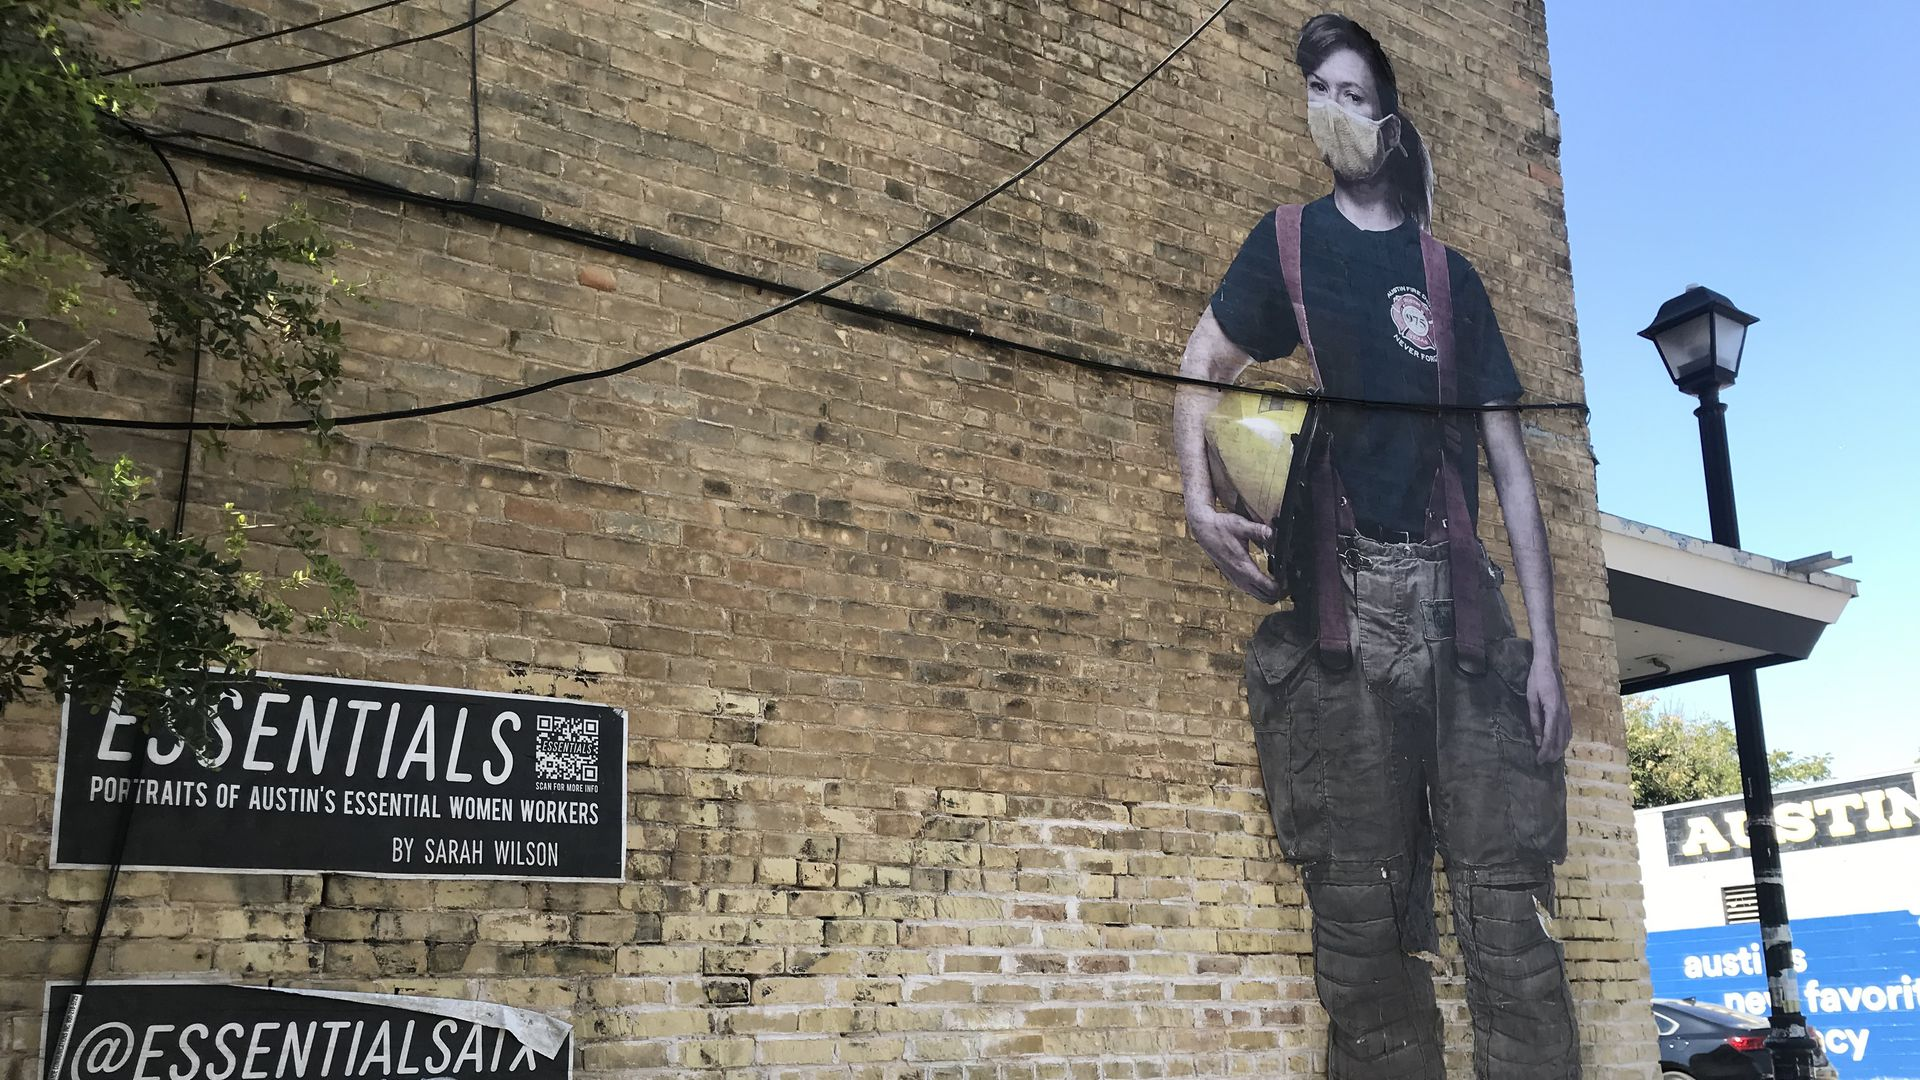 An East Austin mural by Sarah Wilson of an essential woman worker.